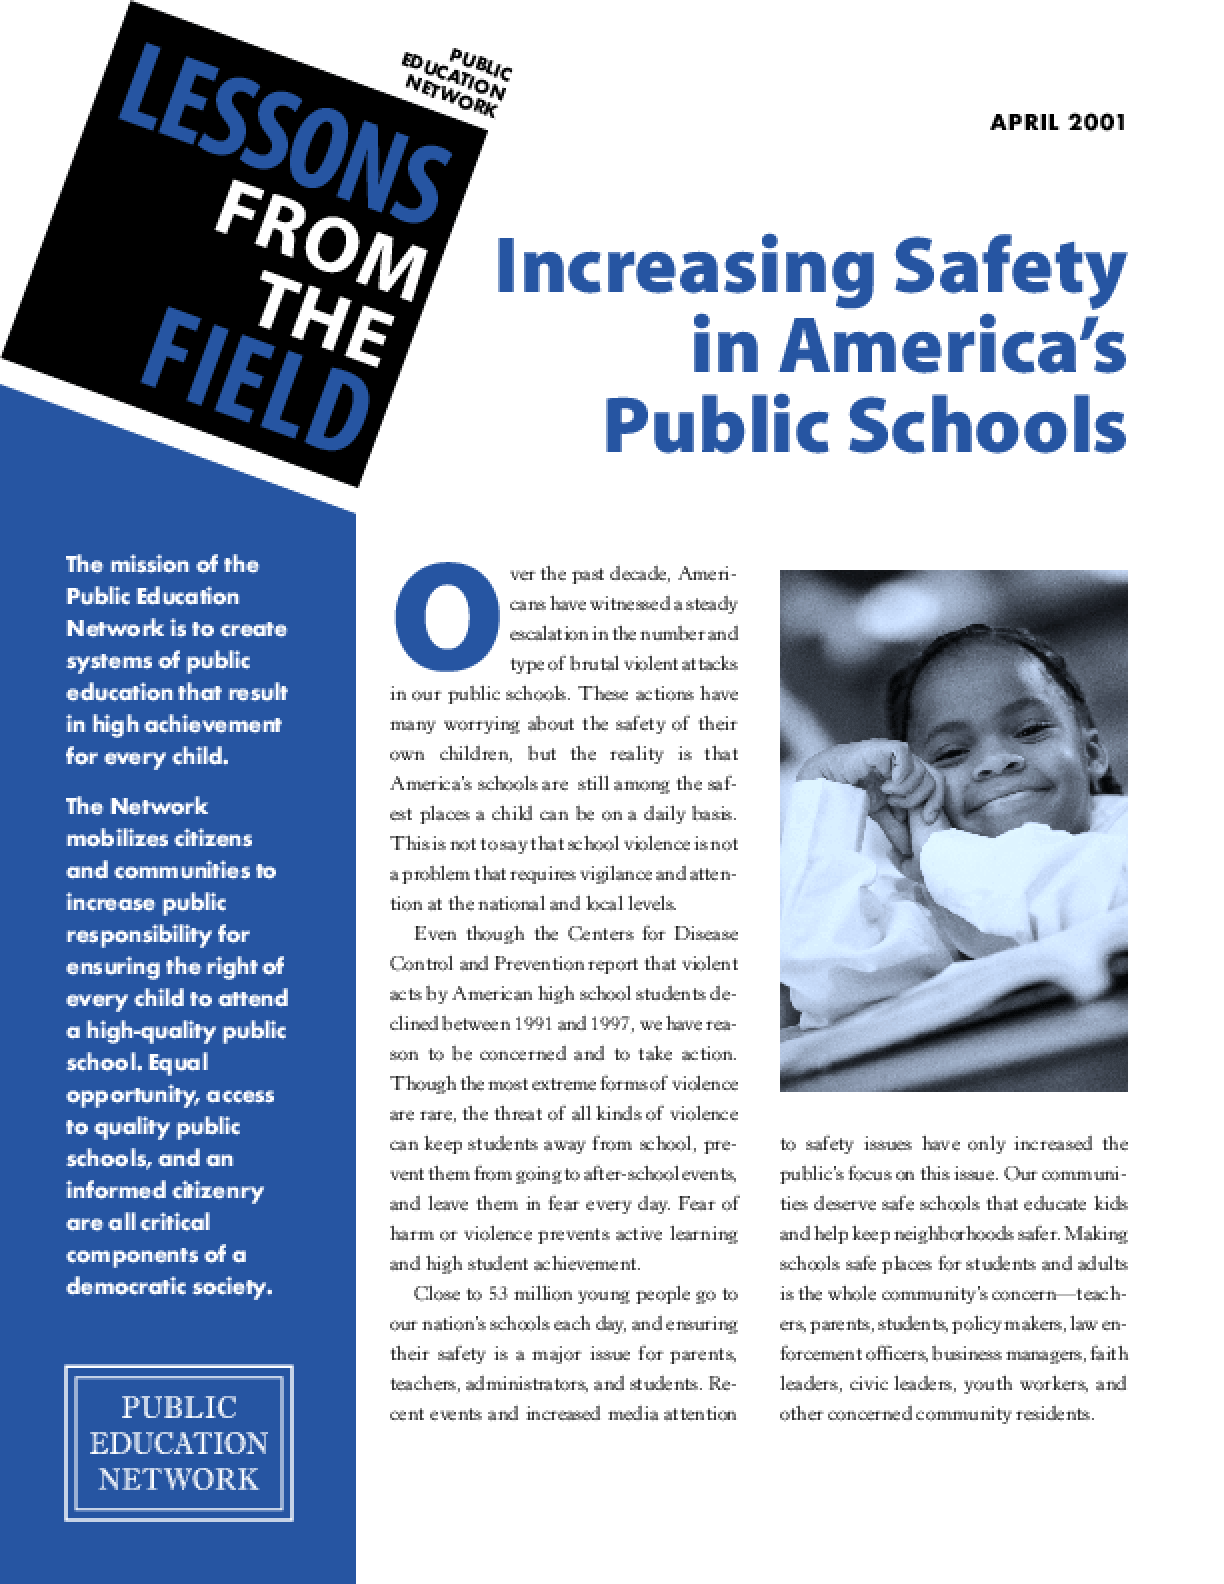 Increasing Safety in America's Public Schools